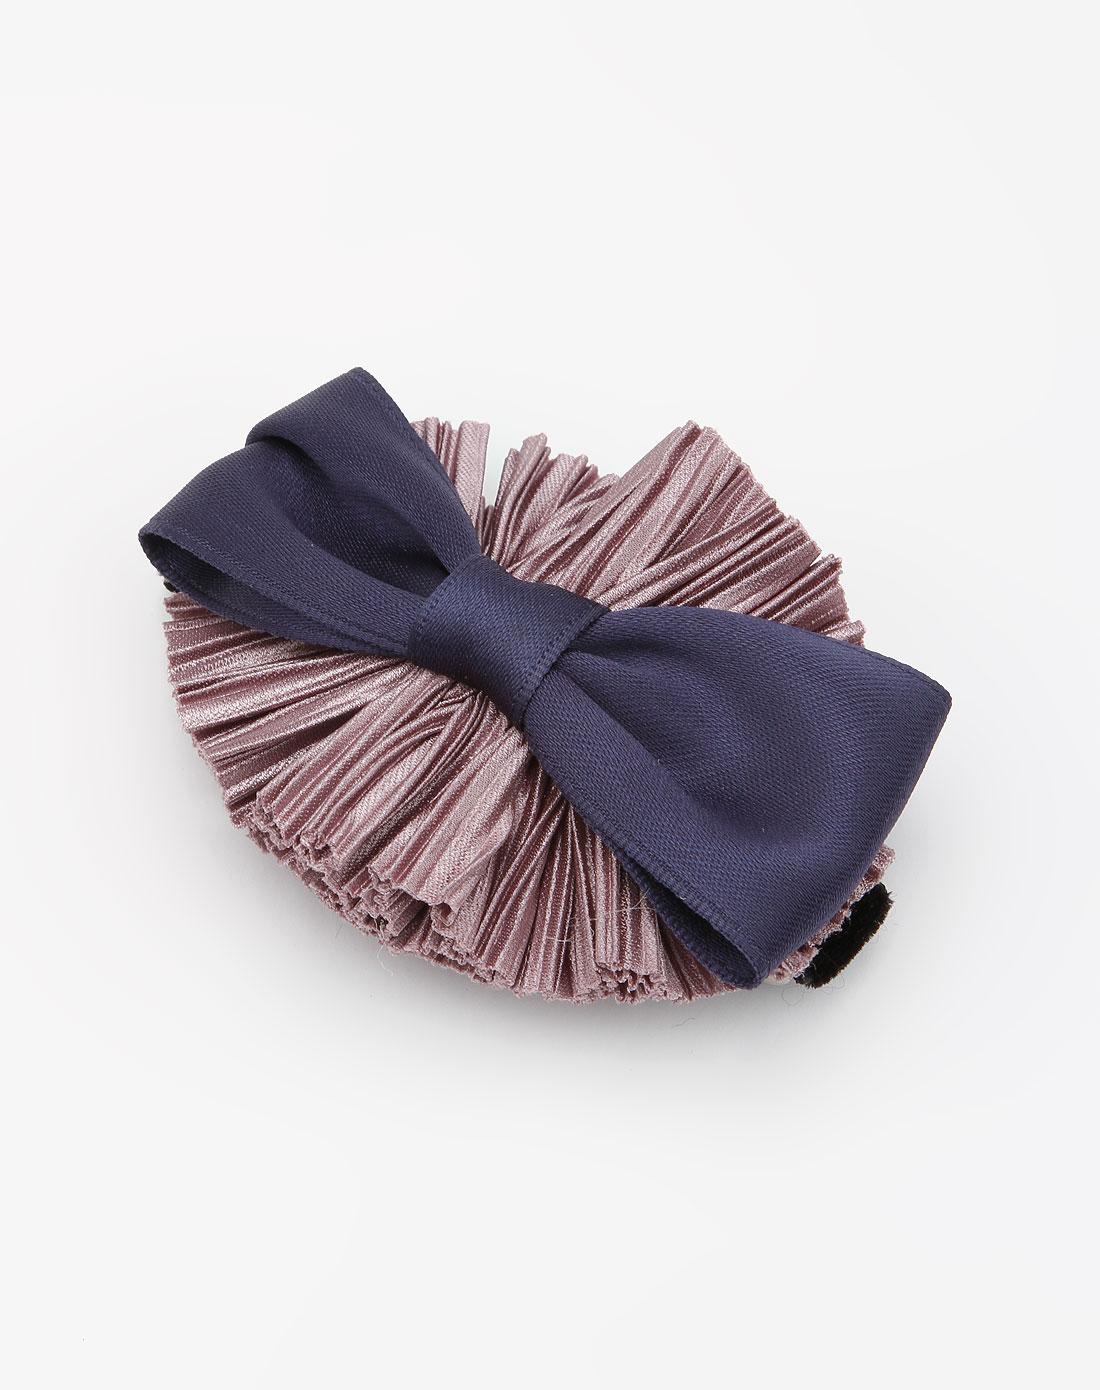 annabella暗紫/深蓝色蝴蝶结时尚发夹a10wn